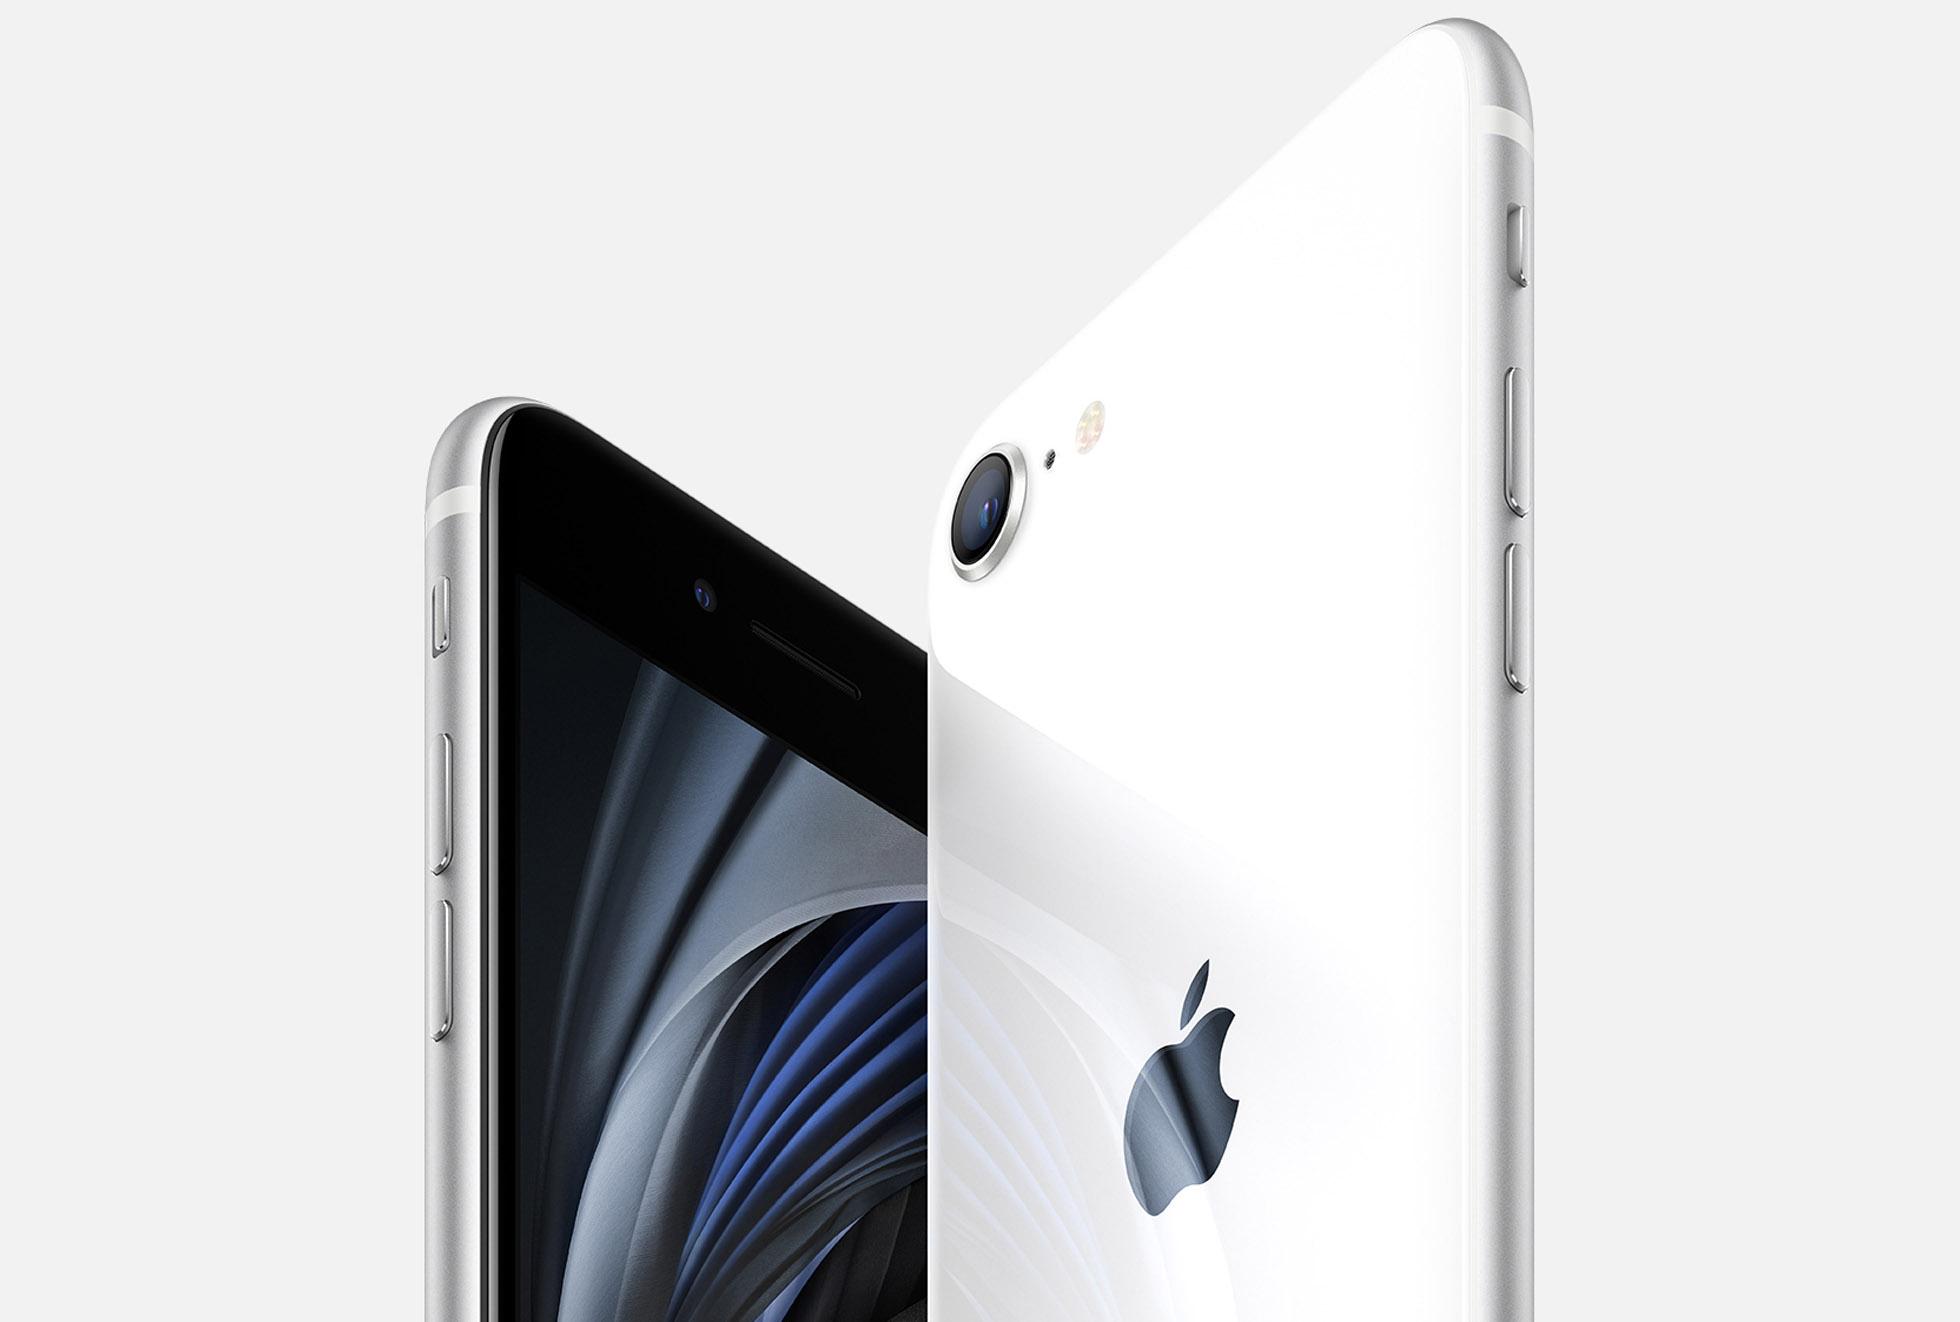 iPhone SE 2020 yang Bakal Bisa Nyaingin Android? 3